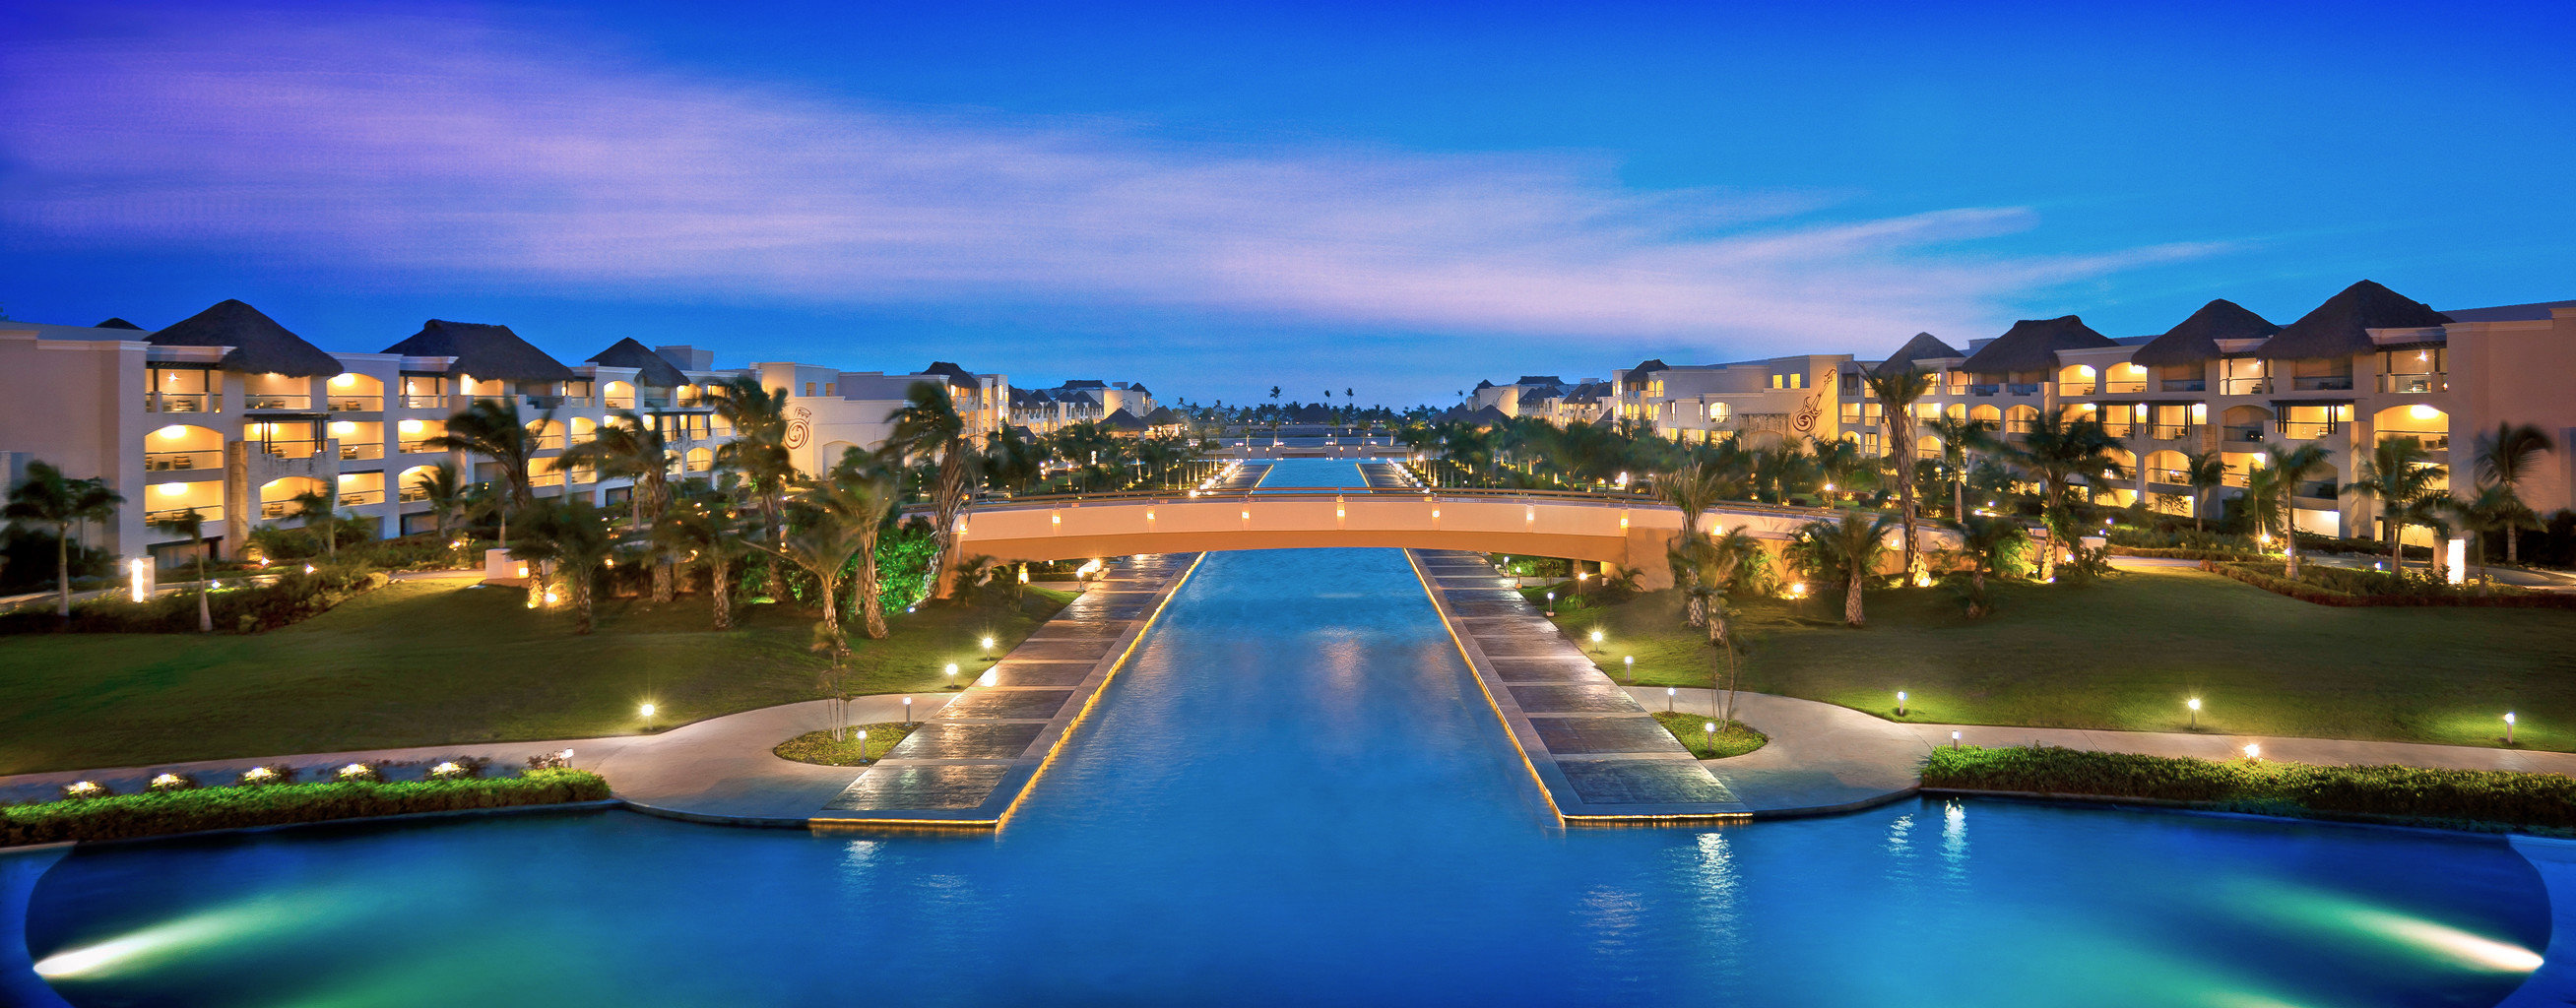 Elegant Hip Luxury Modern Pool sky water Boat leisure swimming pool Resort night cityscape dusk marina shore